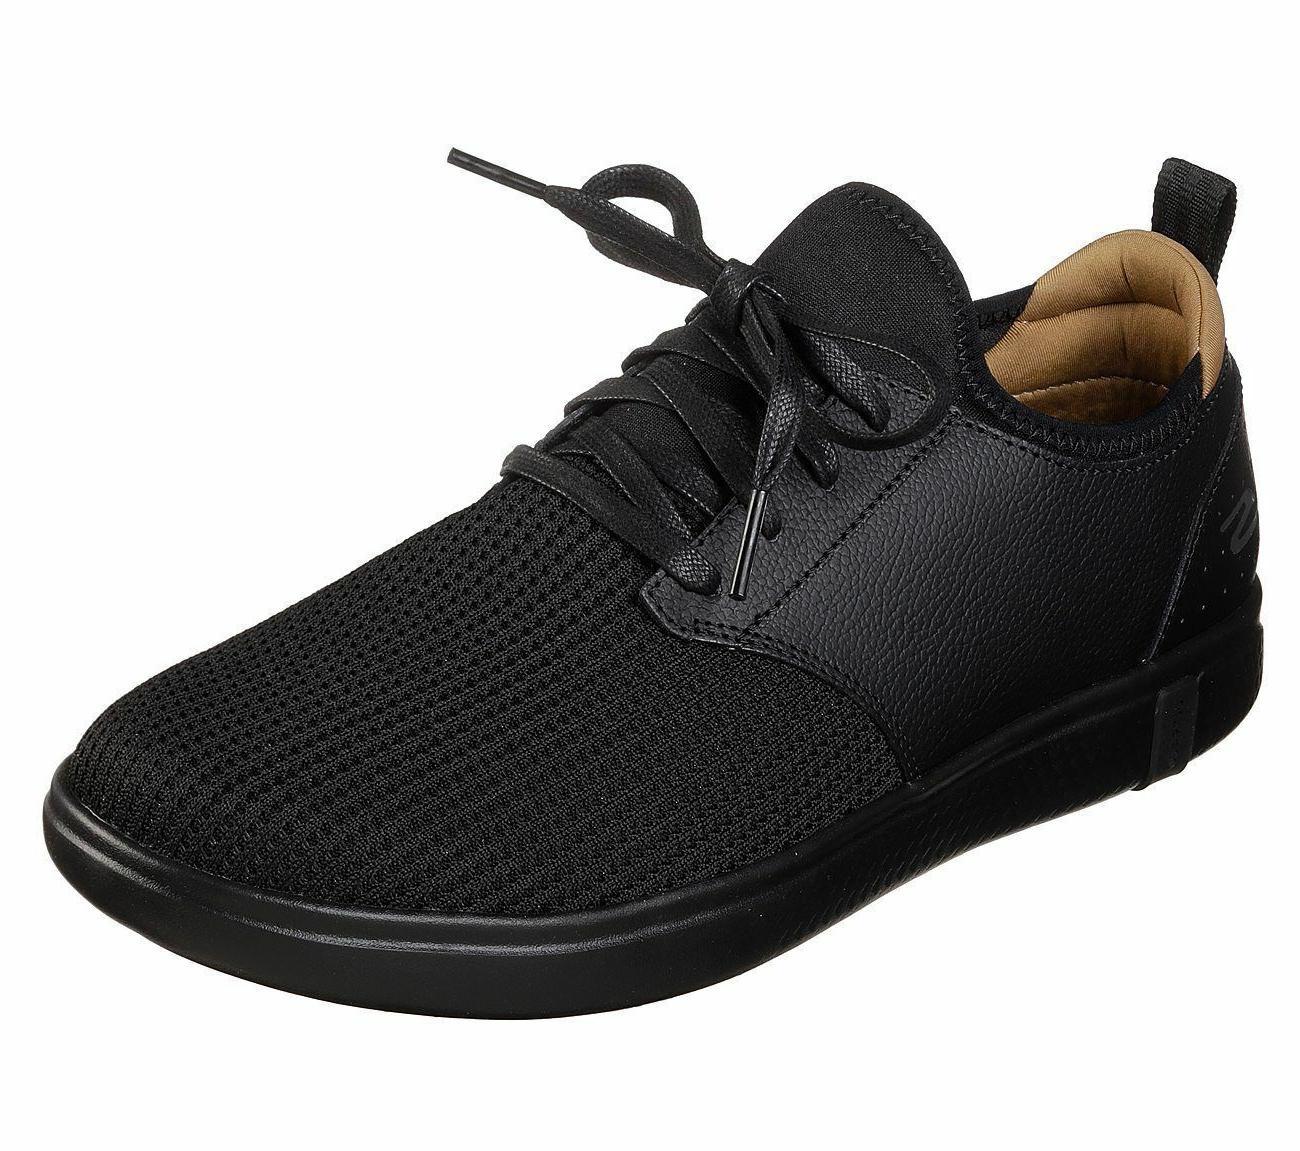 skechers mens dress shoes